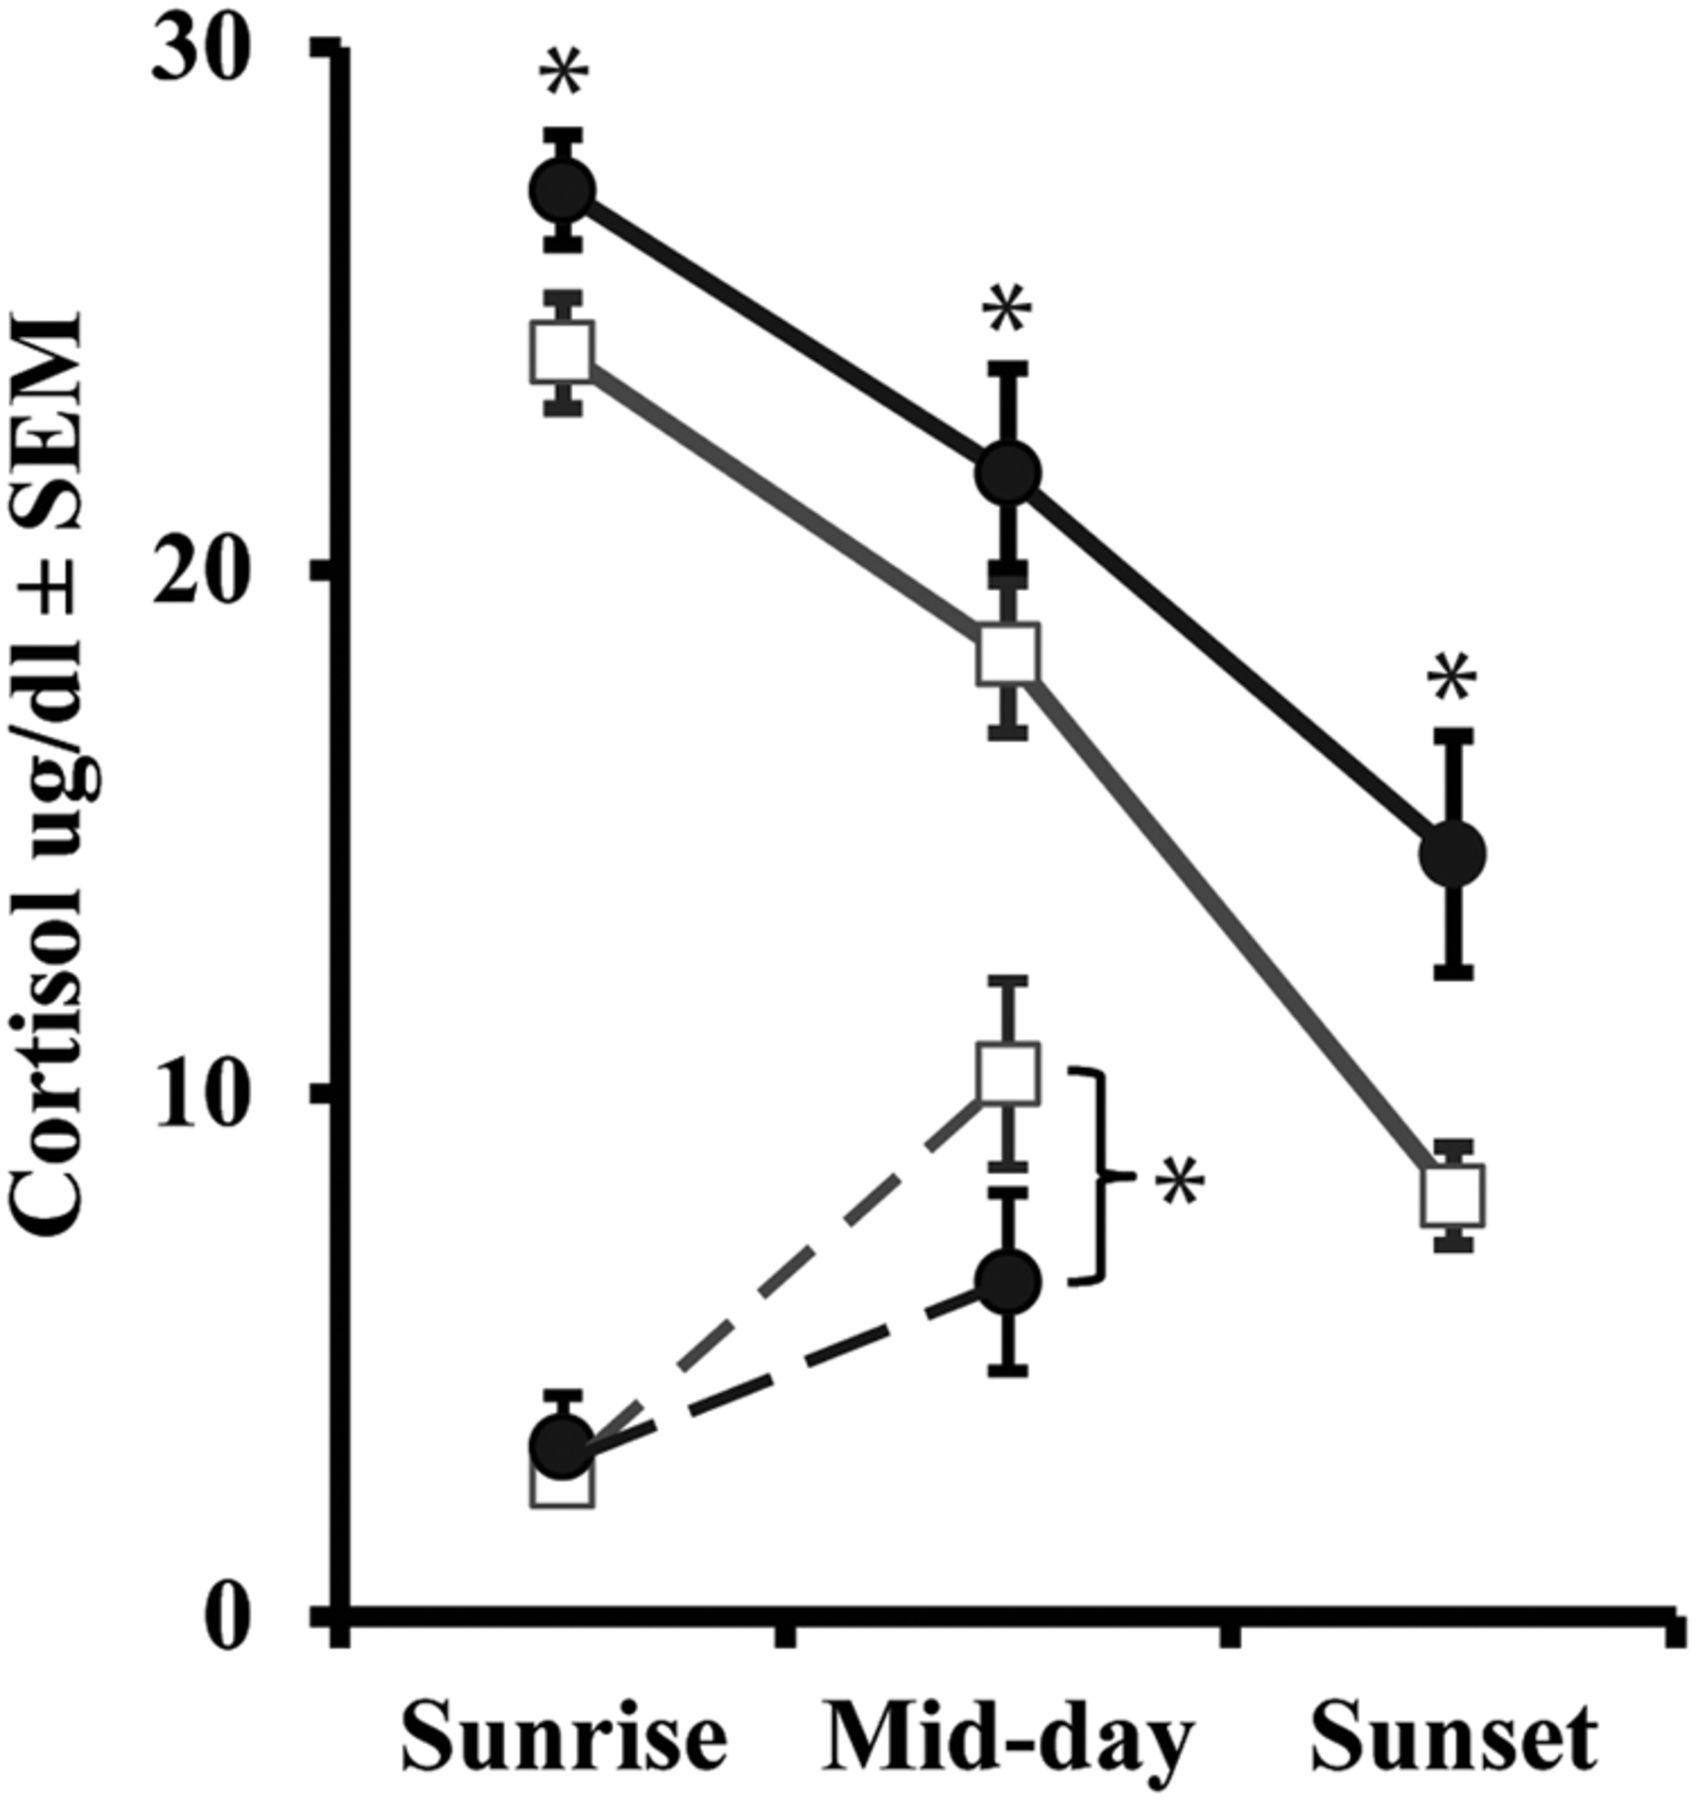 Neonatal Amygdala Lesions Lead to Increased Activity of Brain CRF